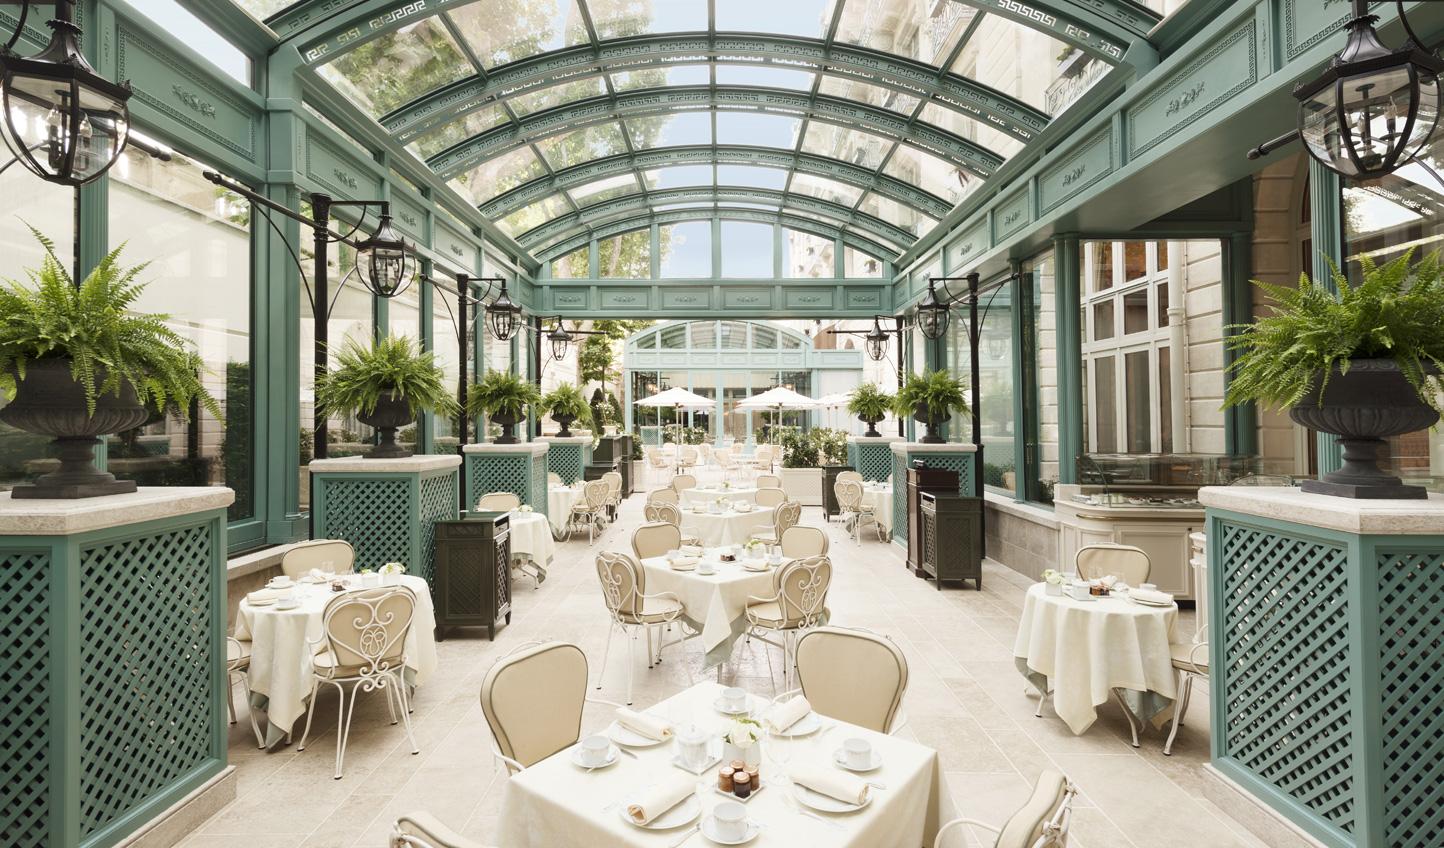 Enjoy your petit-dejeuner in the sunshine at the Ritz Paris